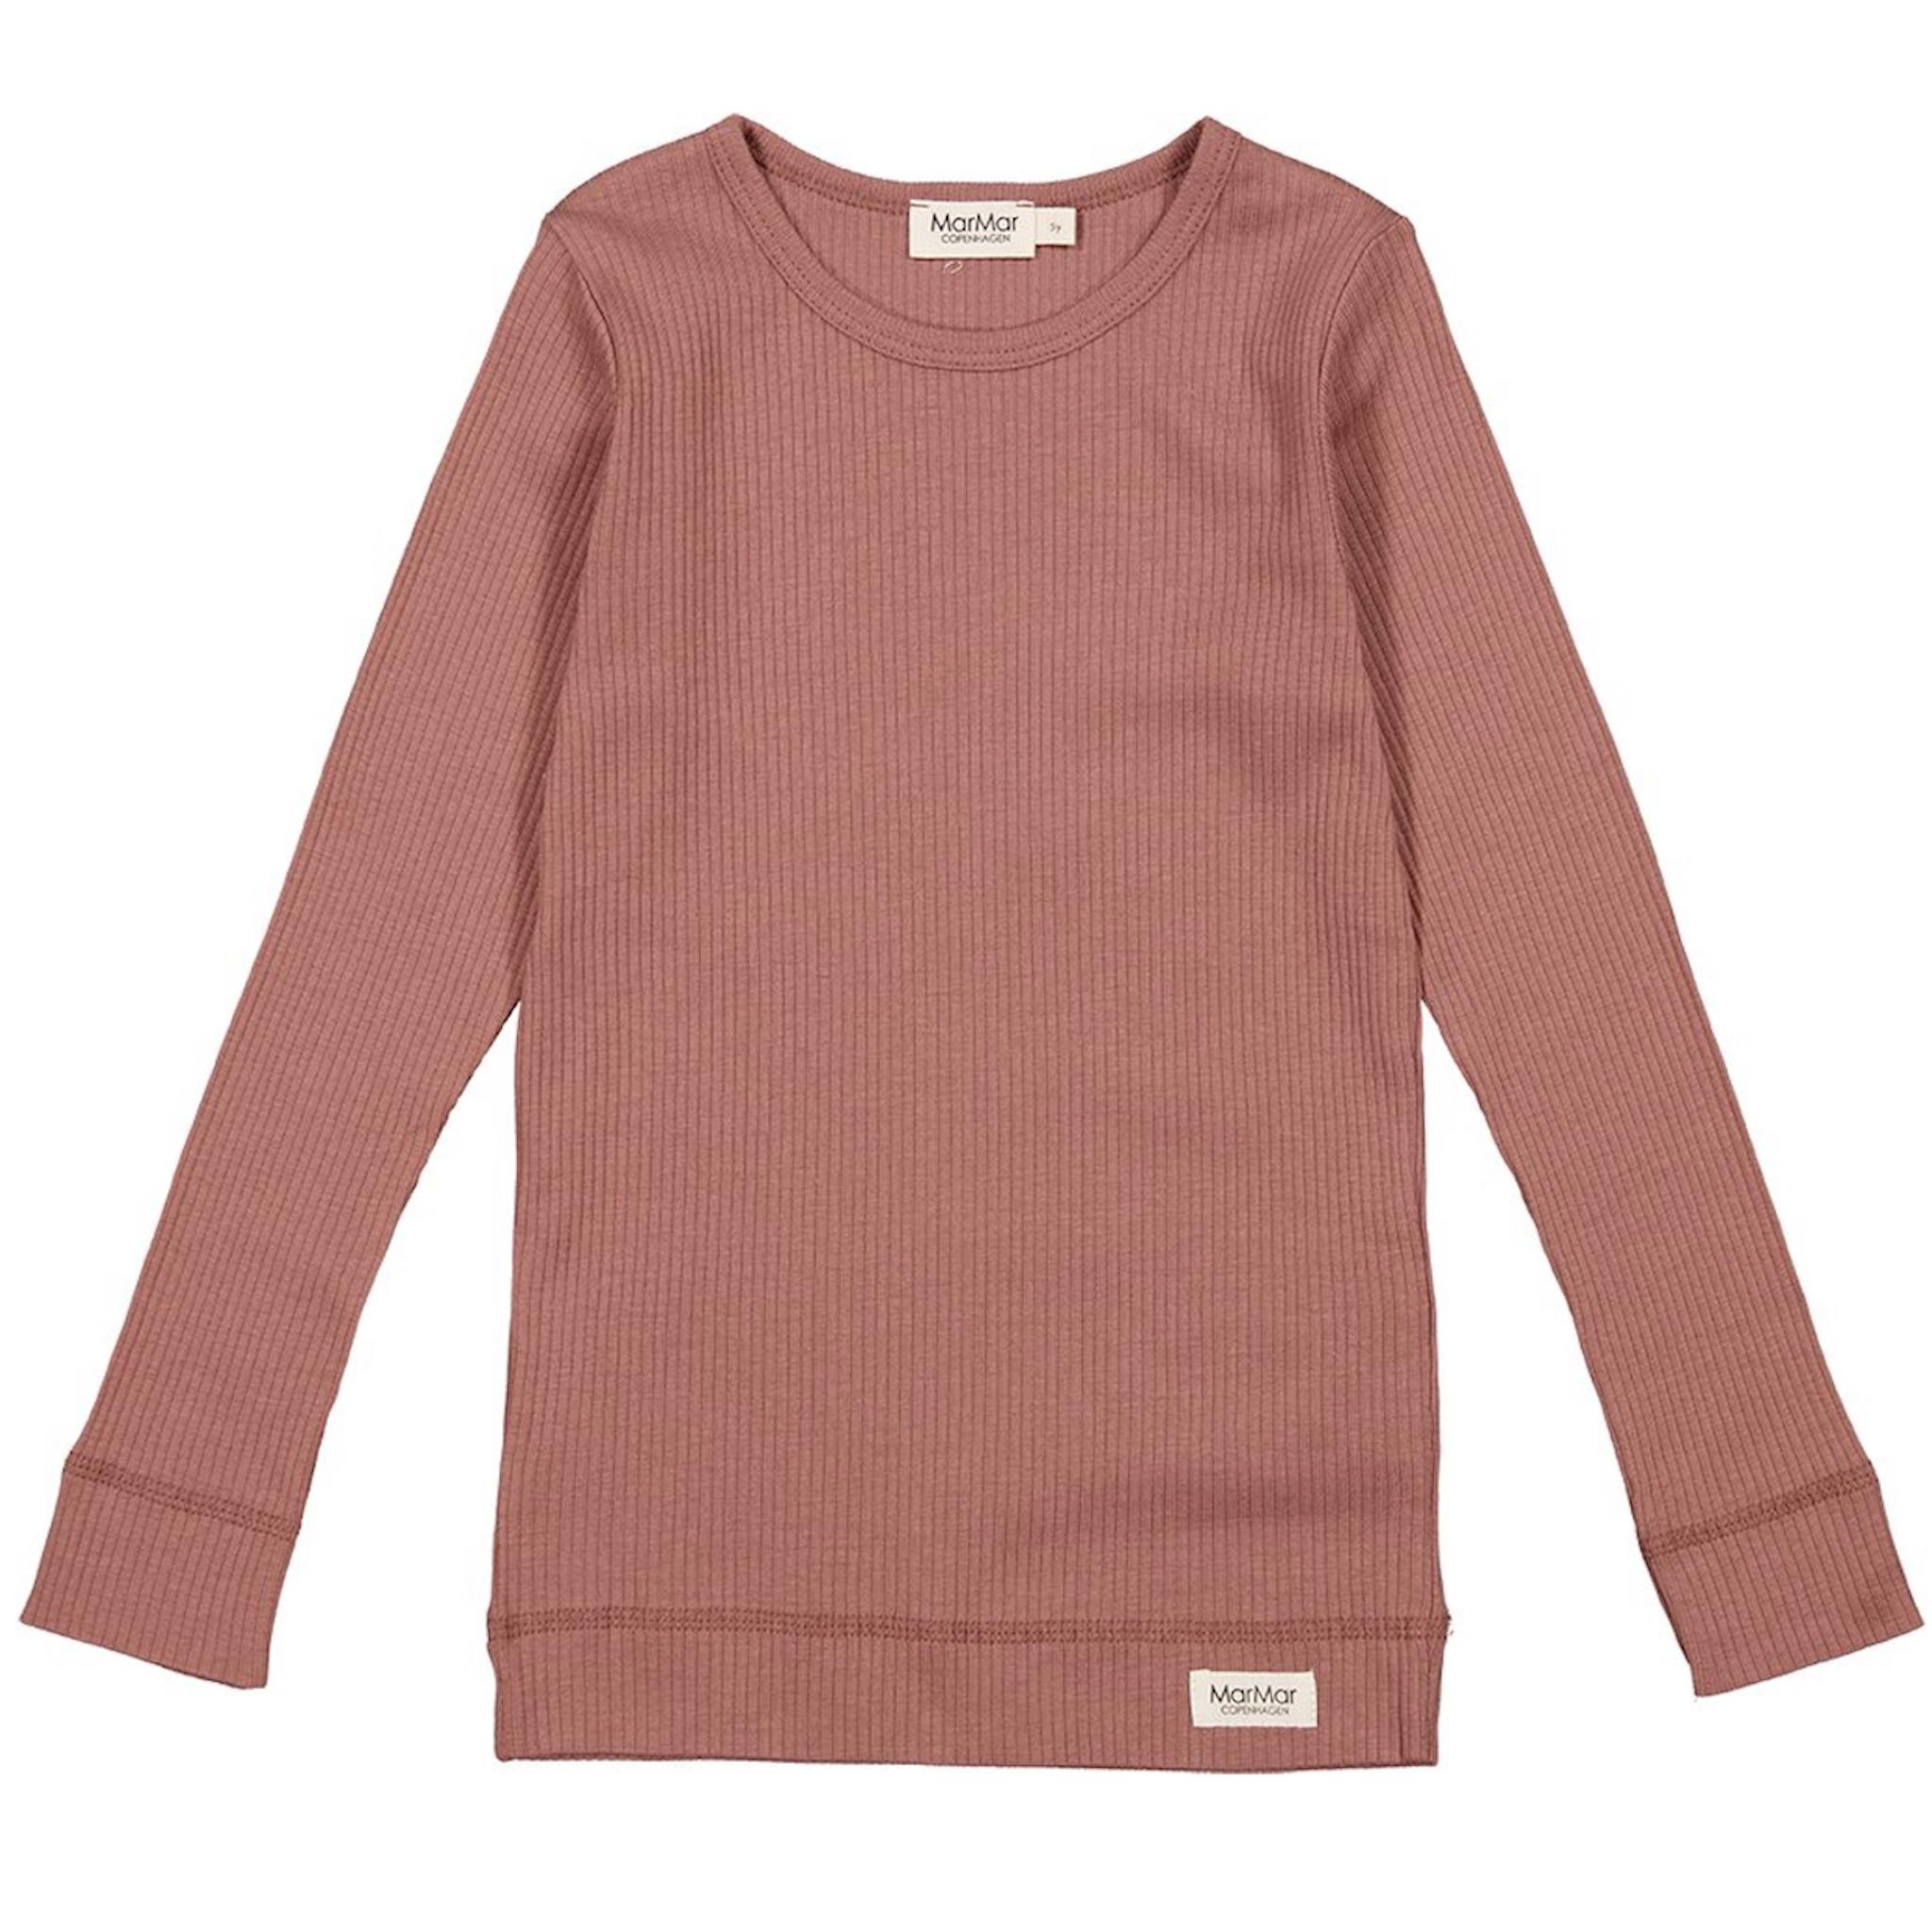 MarMar - Plain Tee LS - madeira rose